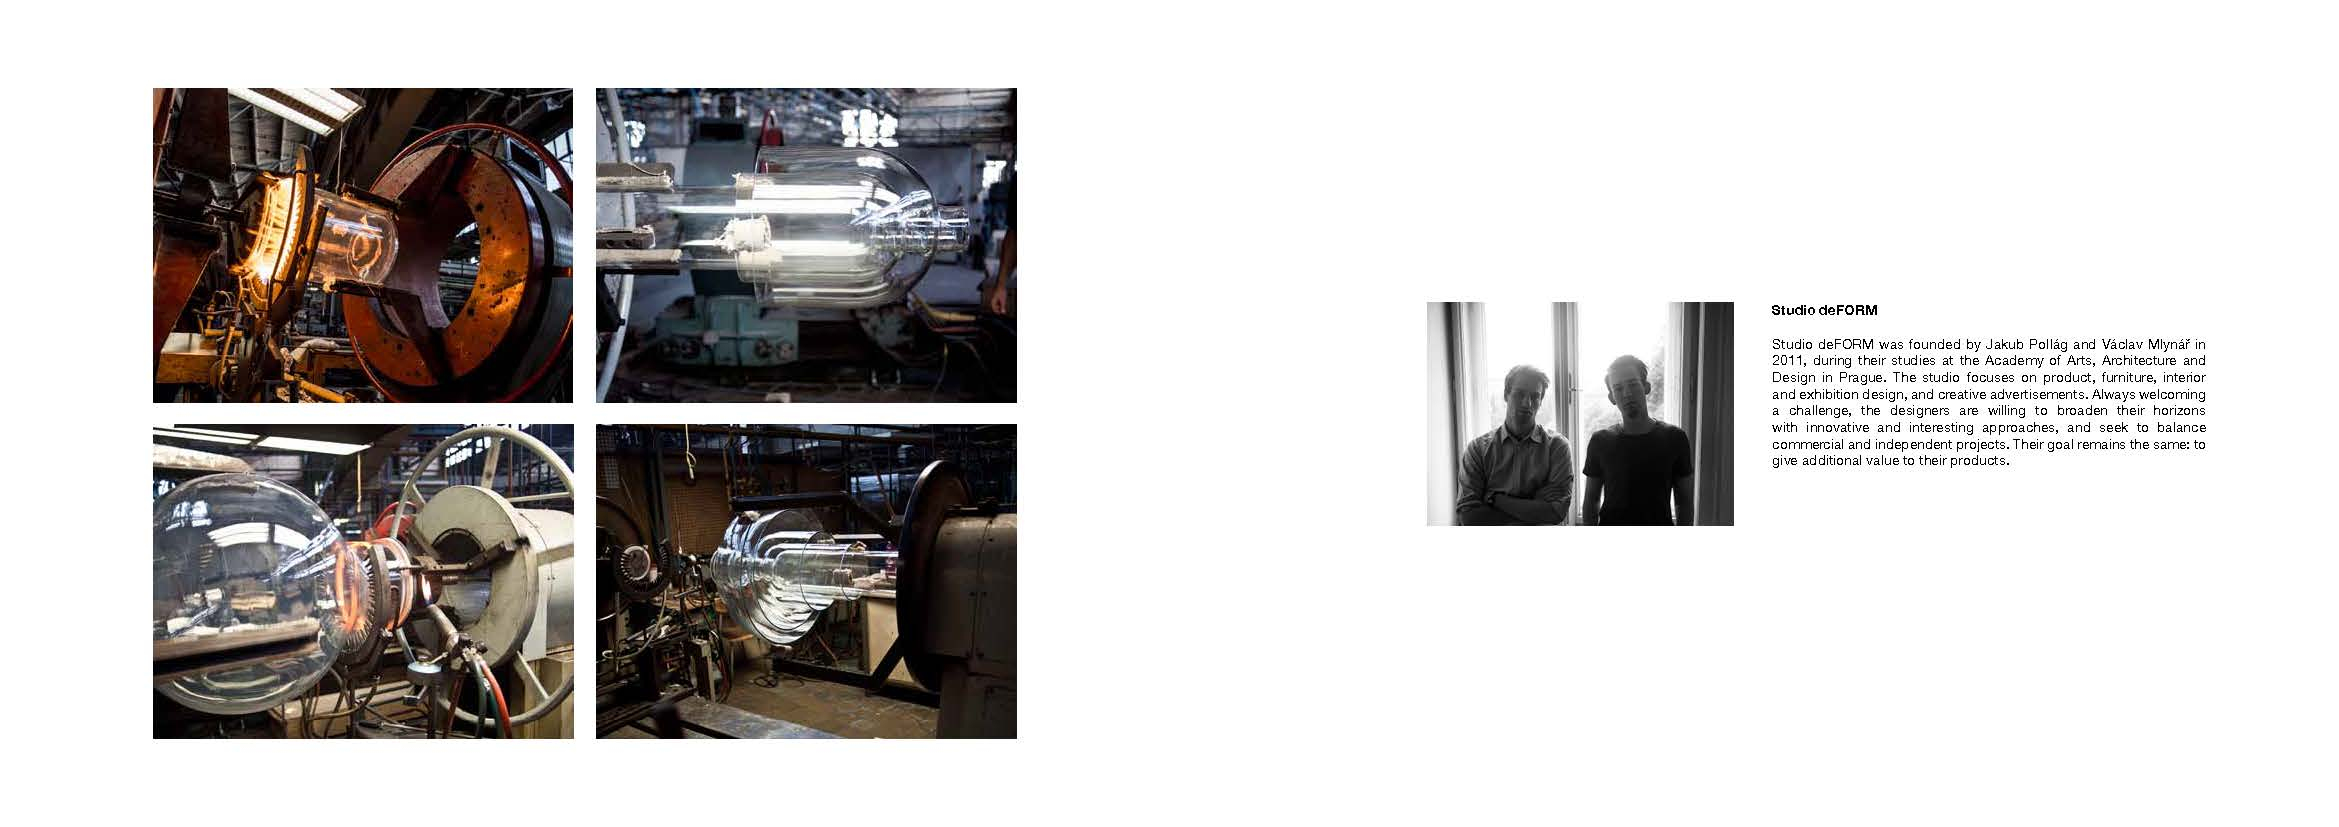 MANIFESTO MASTER FILE 221214 _Page_162.jpg